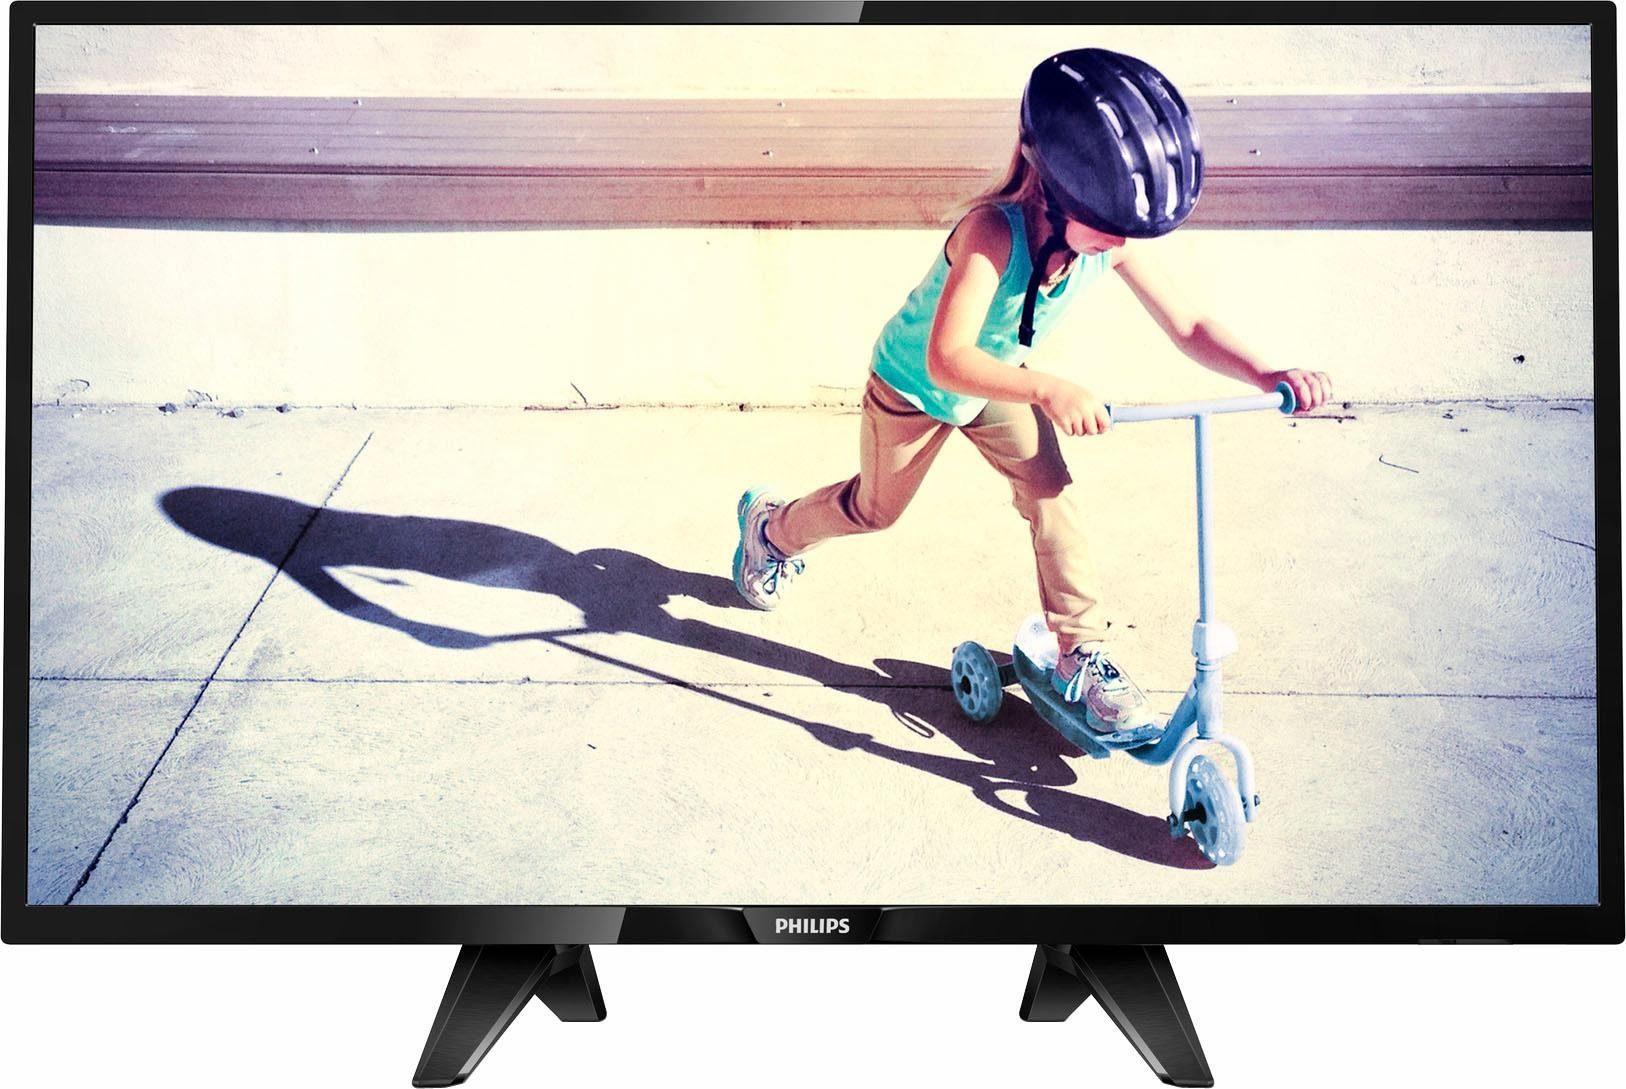 Philips 32PFS4132/12 LED-Fernseher (80 cm/32 Zoll, Full HD)